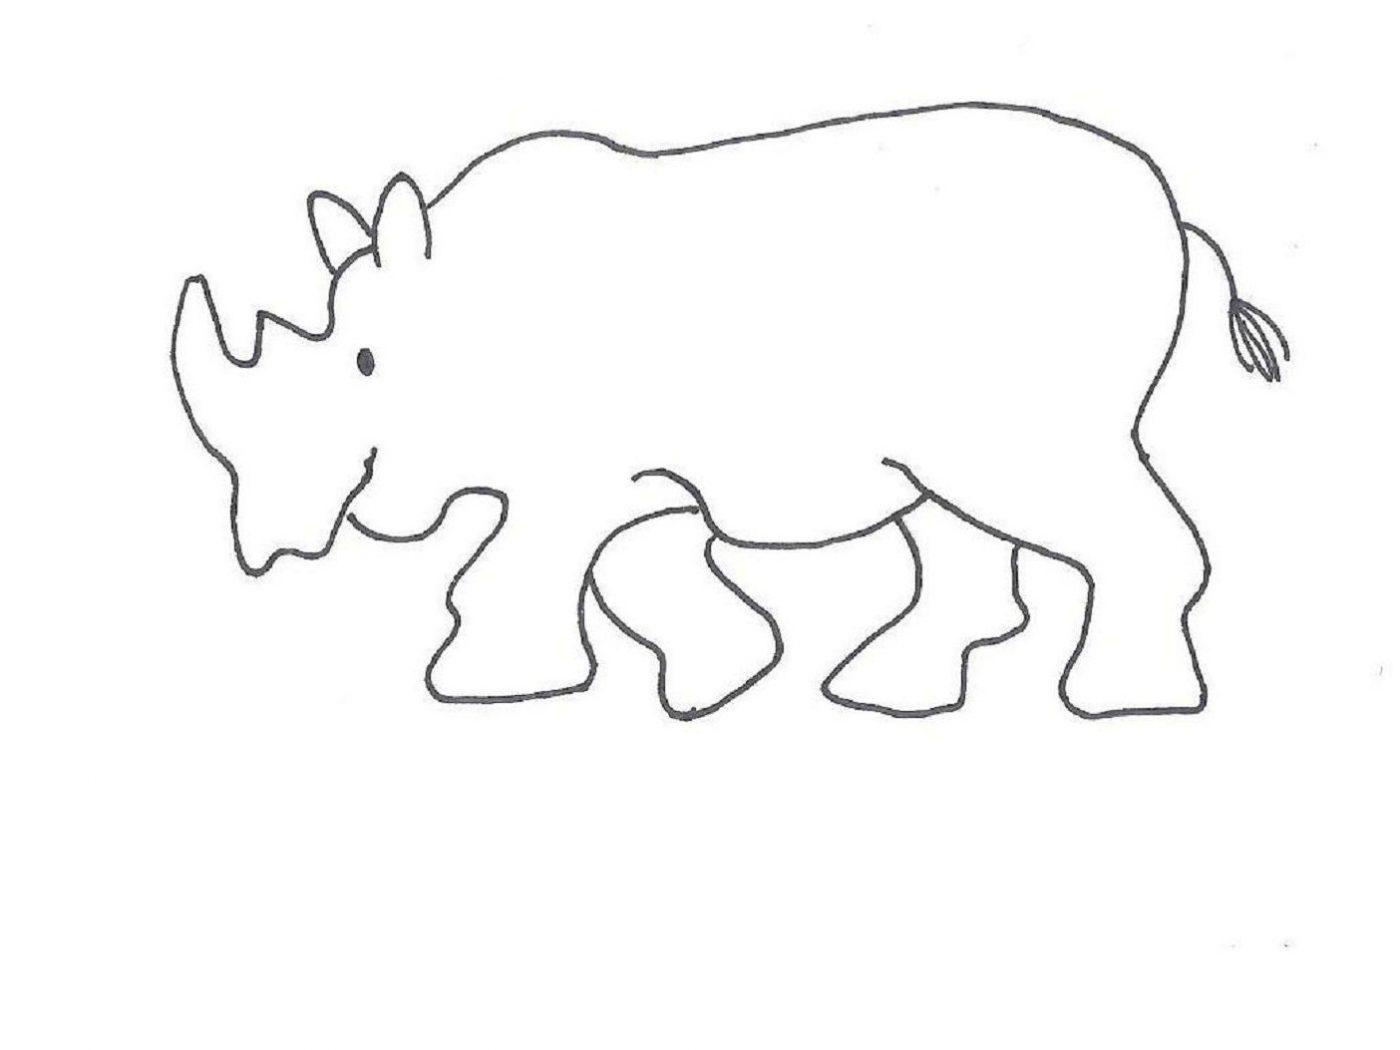 Rhino Cartoon Drawing at GetDrawings.com | Free for personal use ...